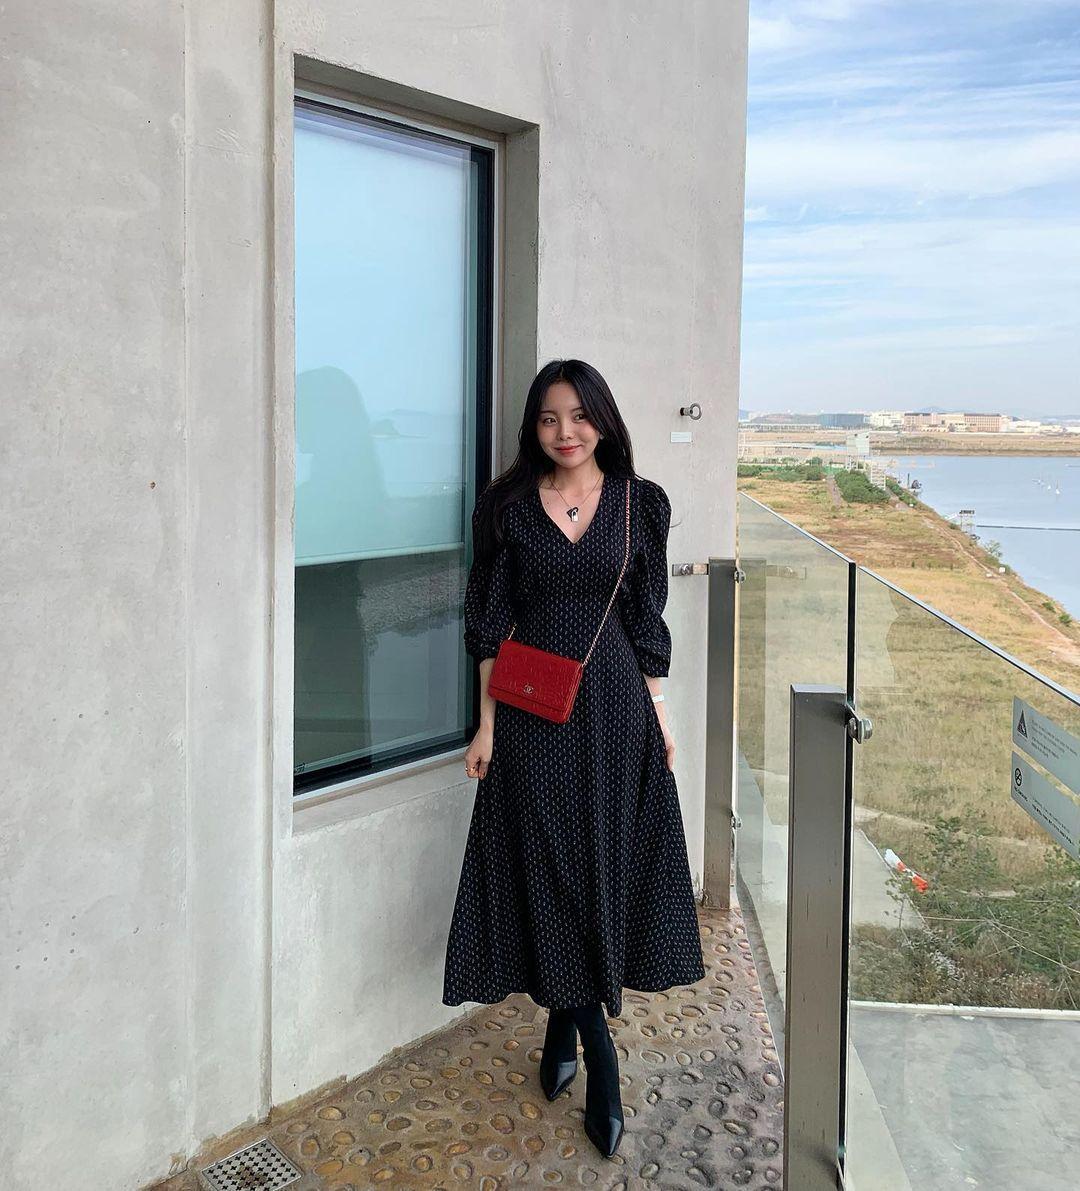 Intip Gaya Jung Jiwoo, Kakak J-Hope BTS yang Terkenal Modis